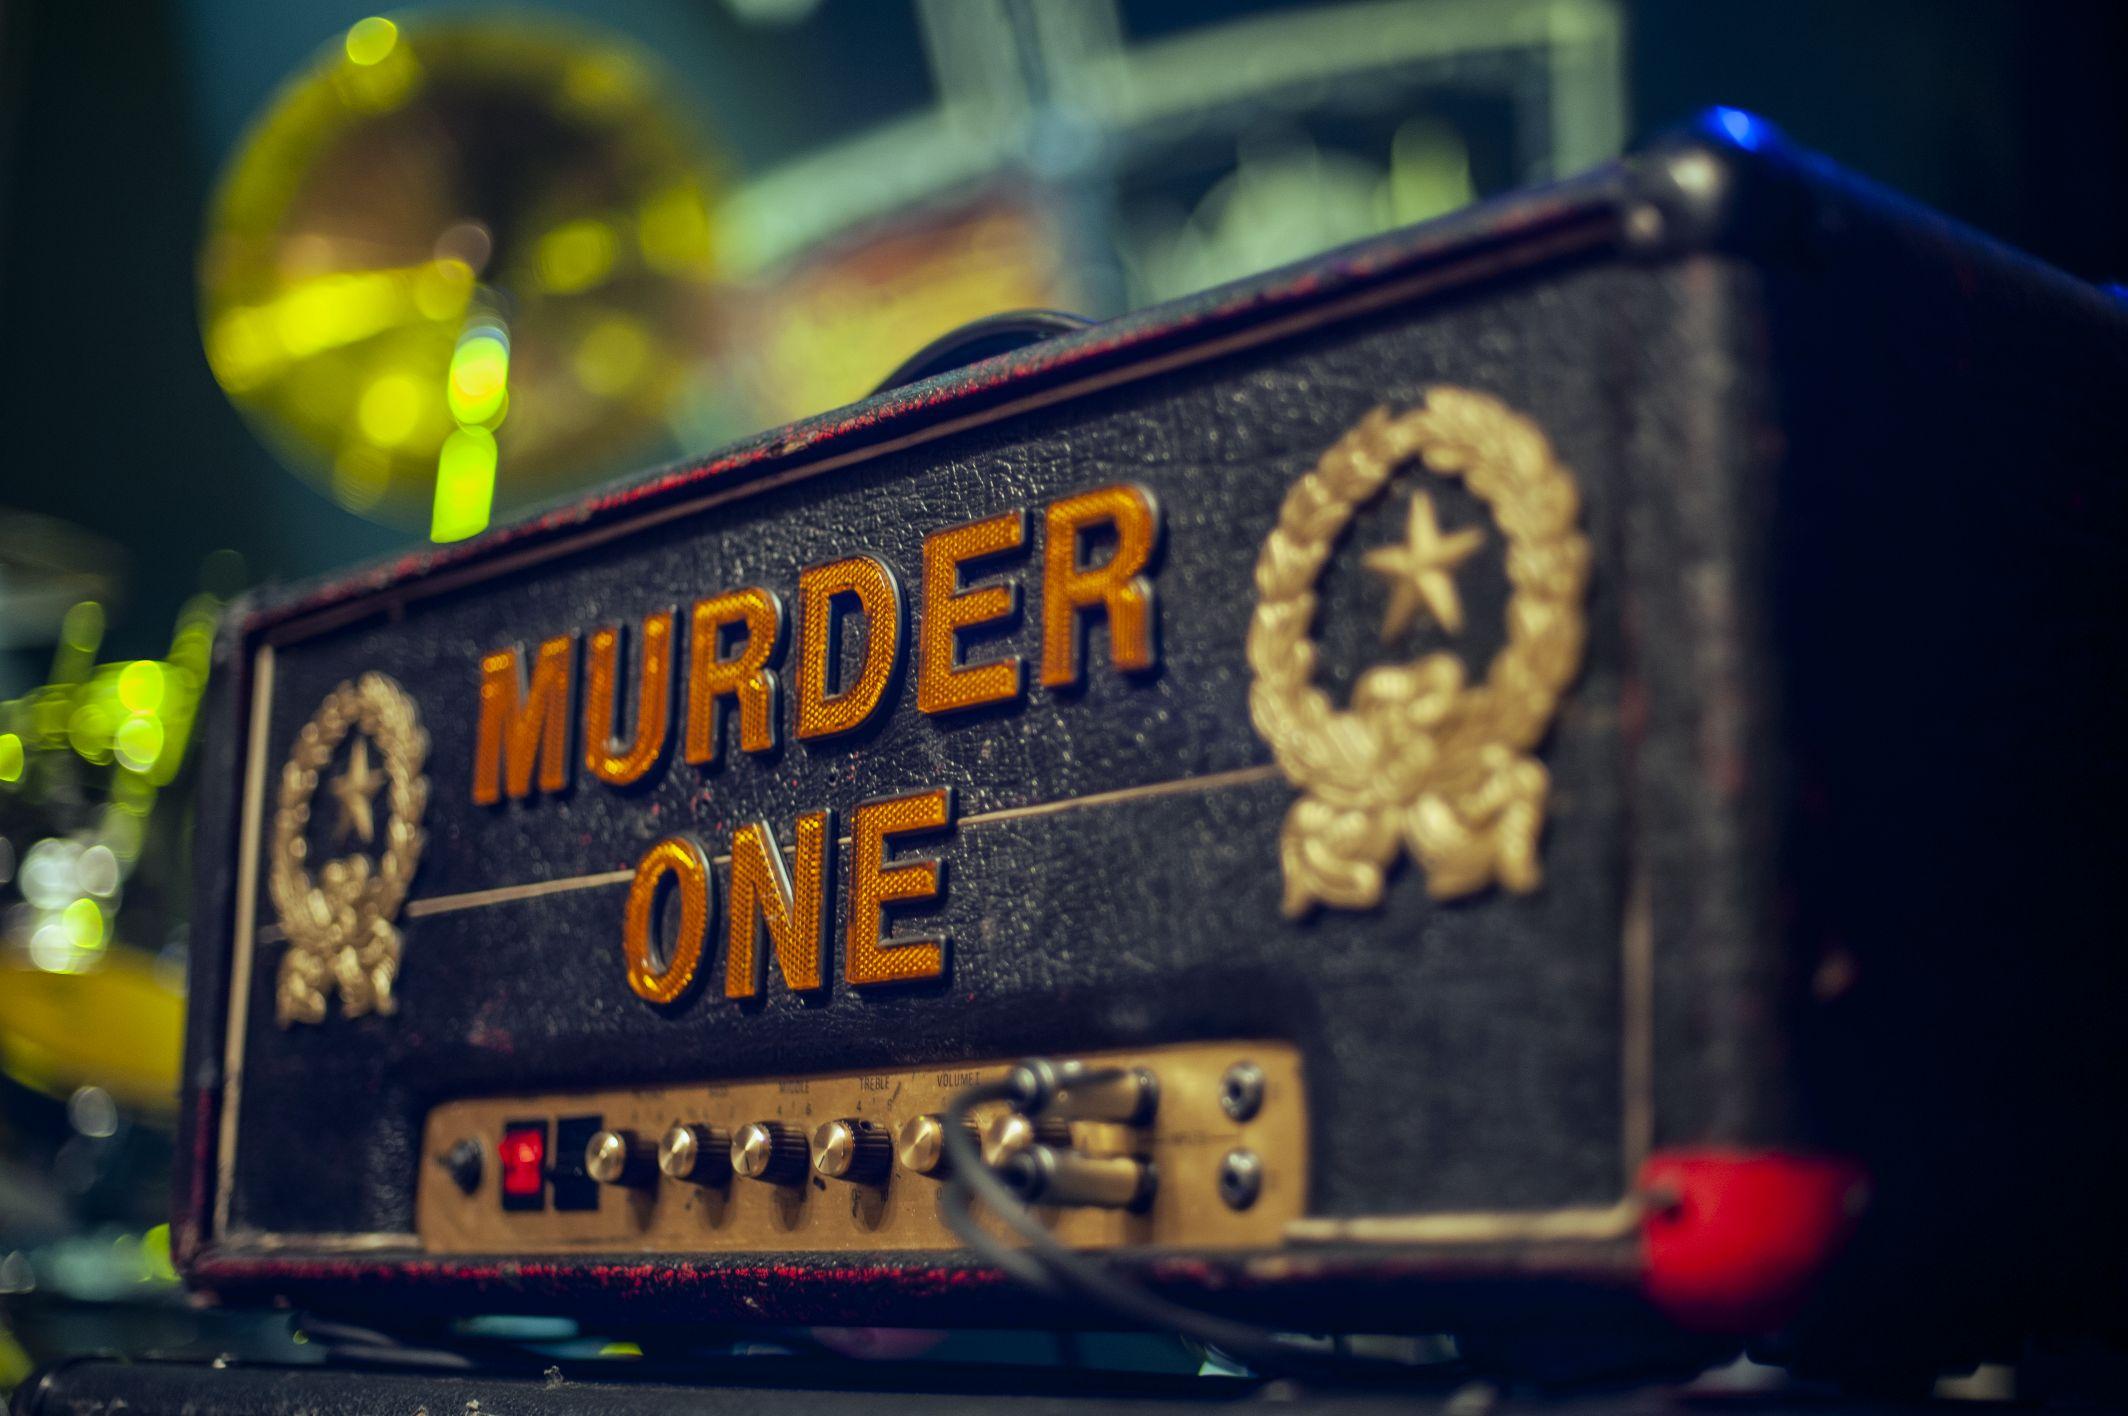 10_Murder1_(Photo_by_Pep_Bonet)